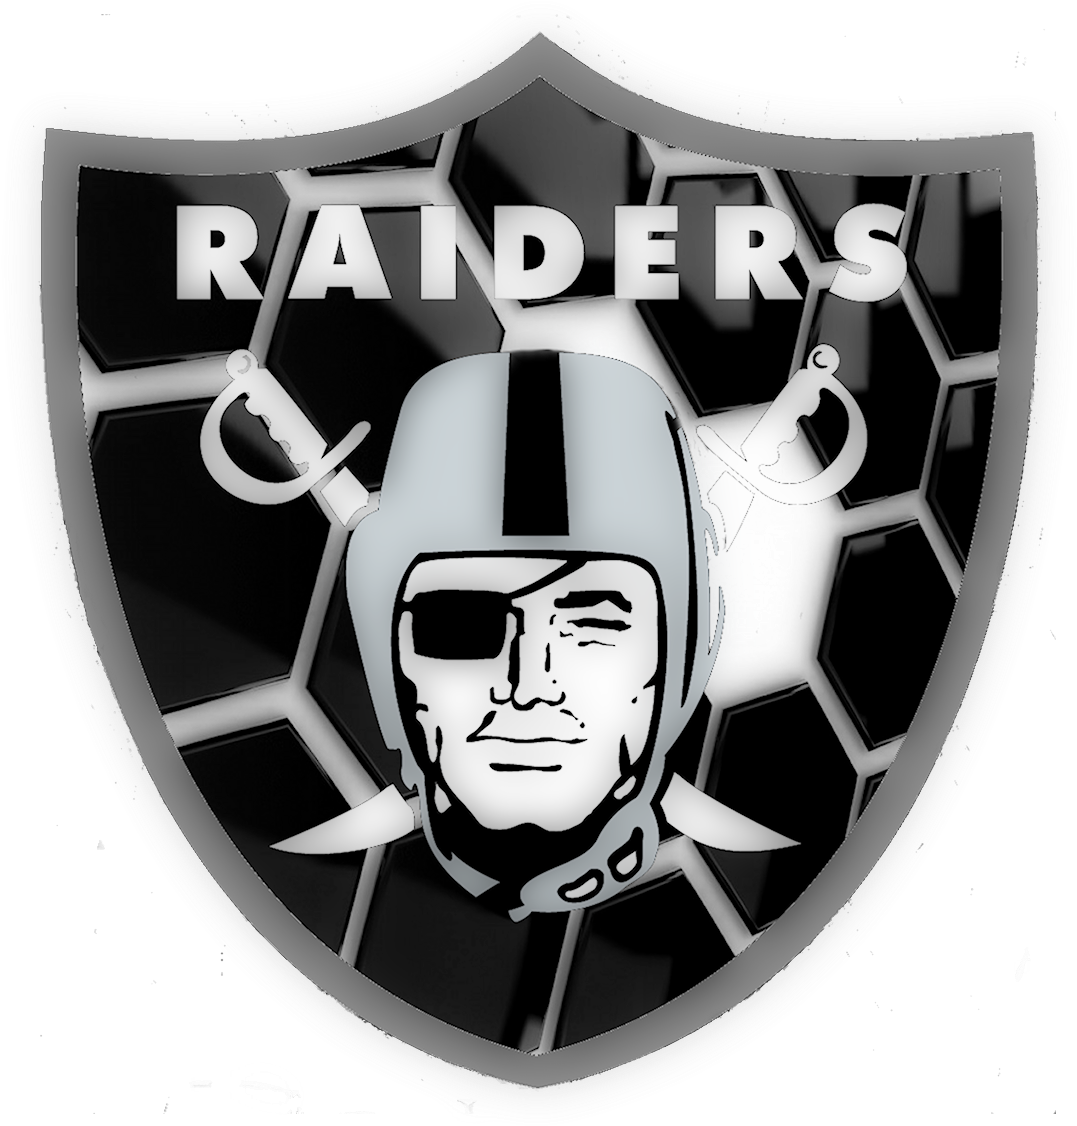 oakland raiders logo clipart 10 free Cliparts | Download ...